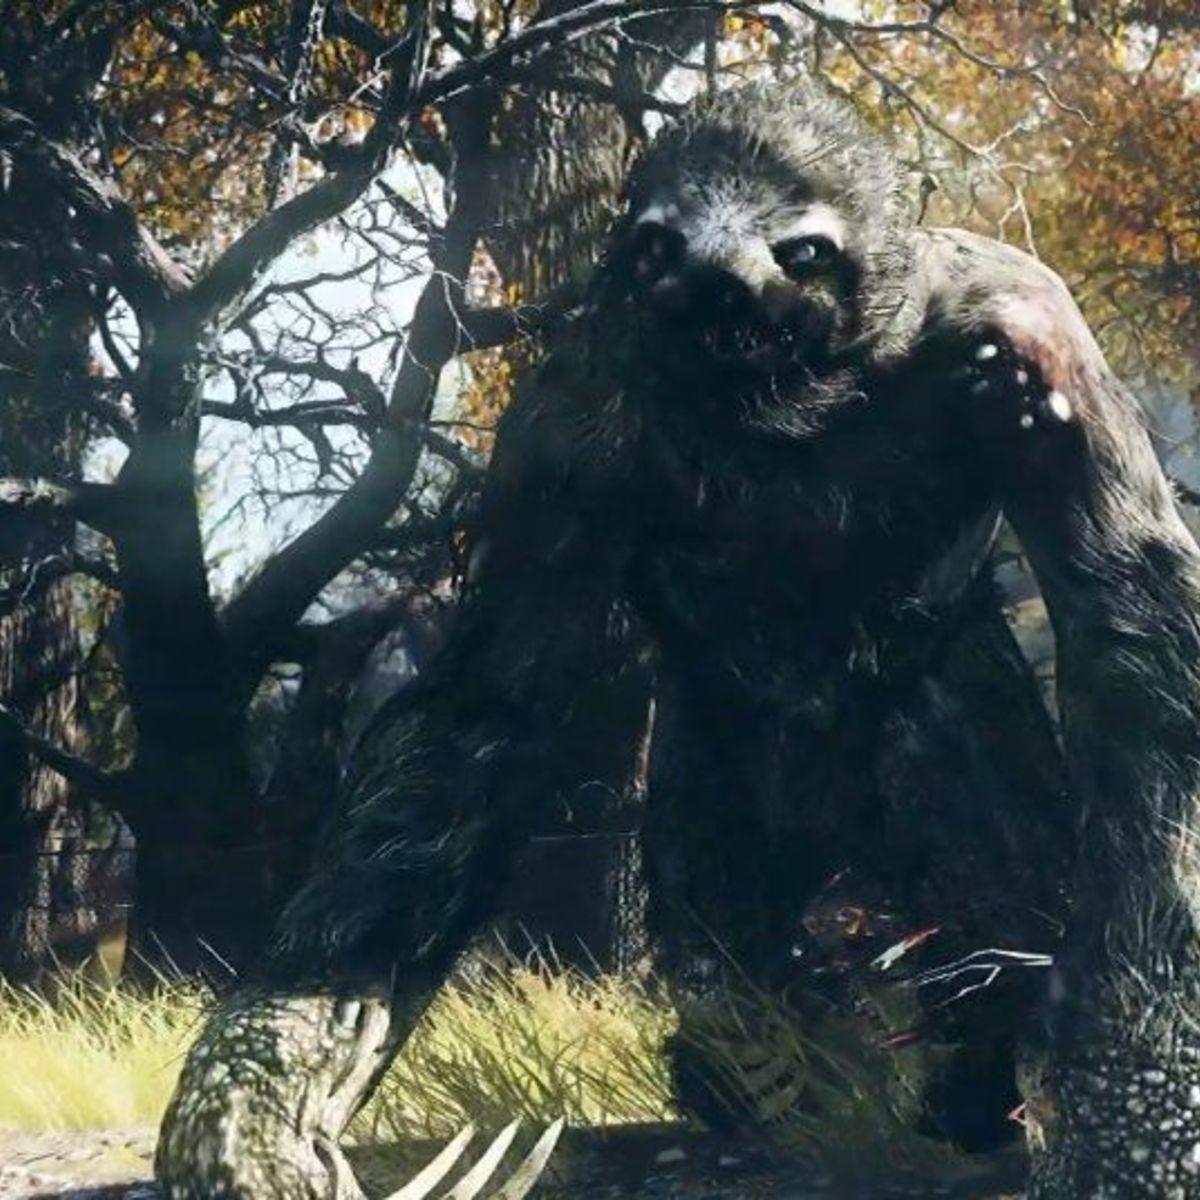 Giant Mutated Sloth